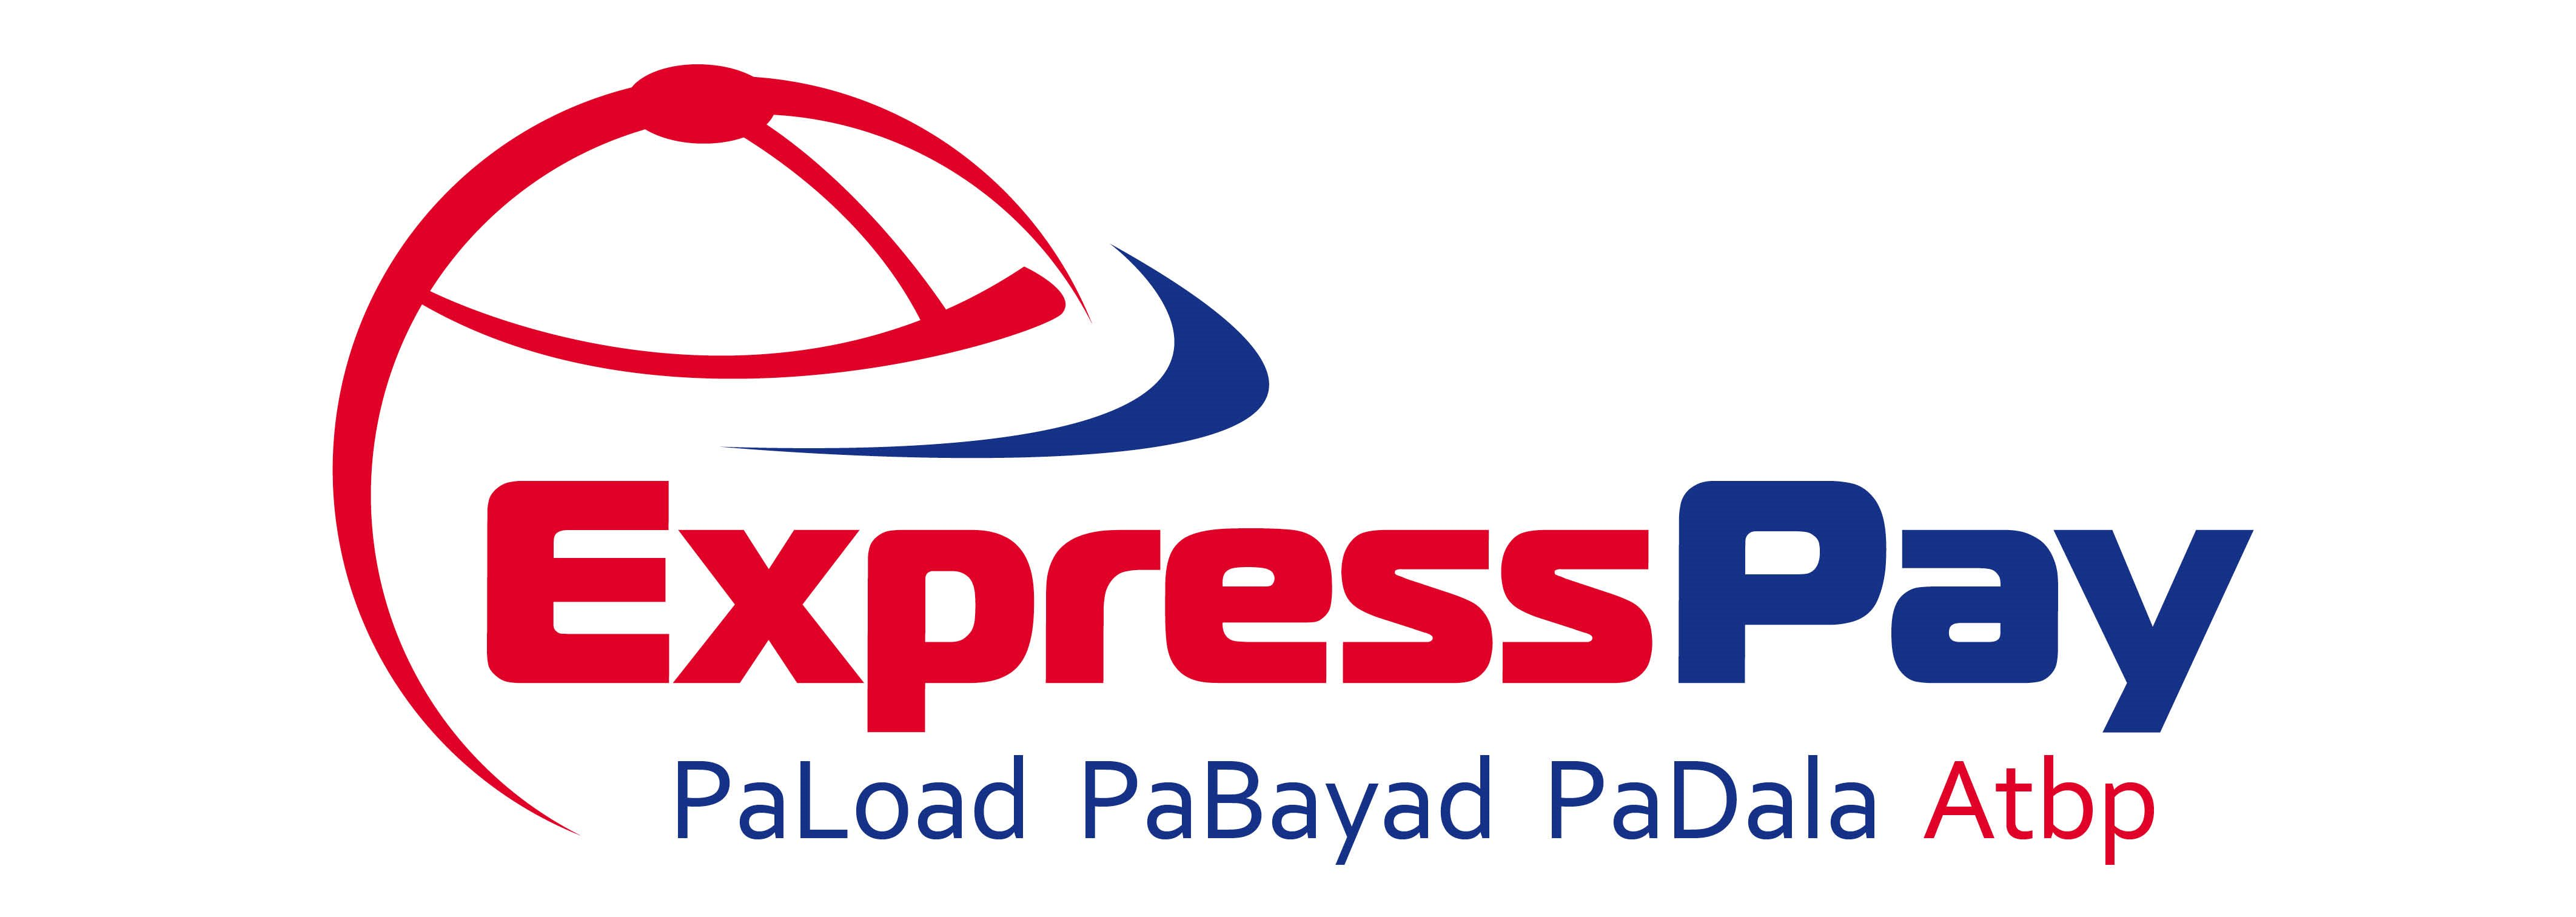 Expresspay Inc.